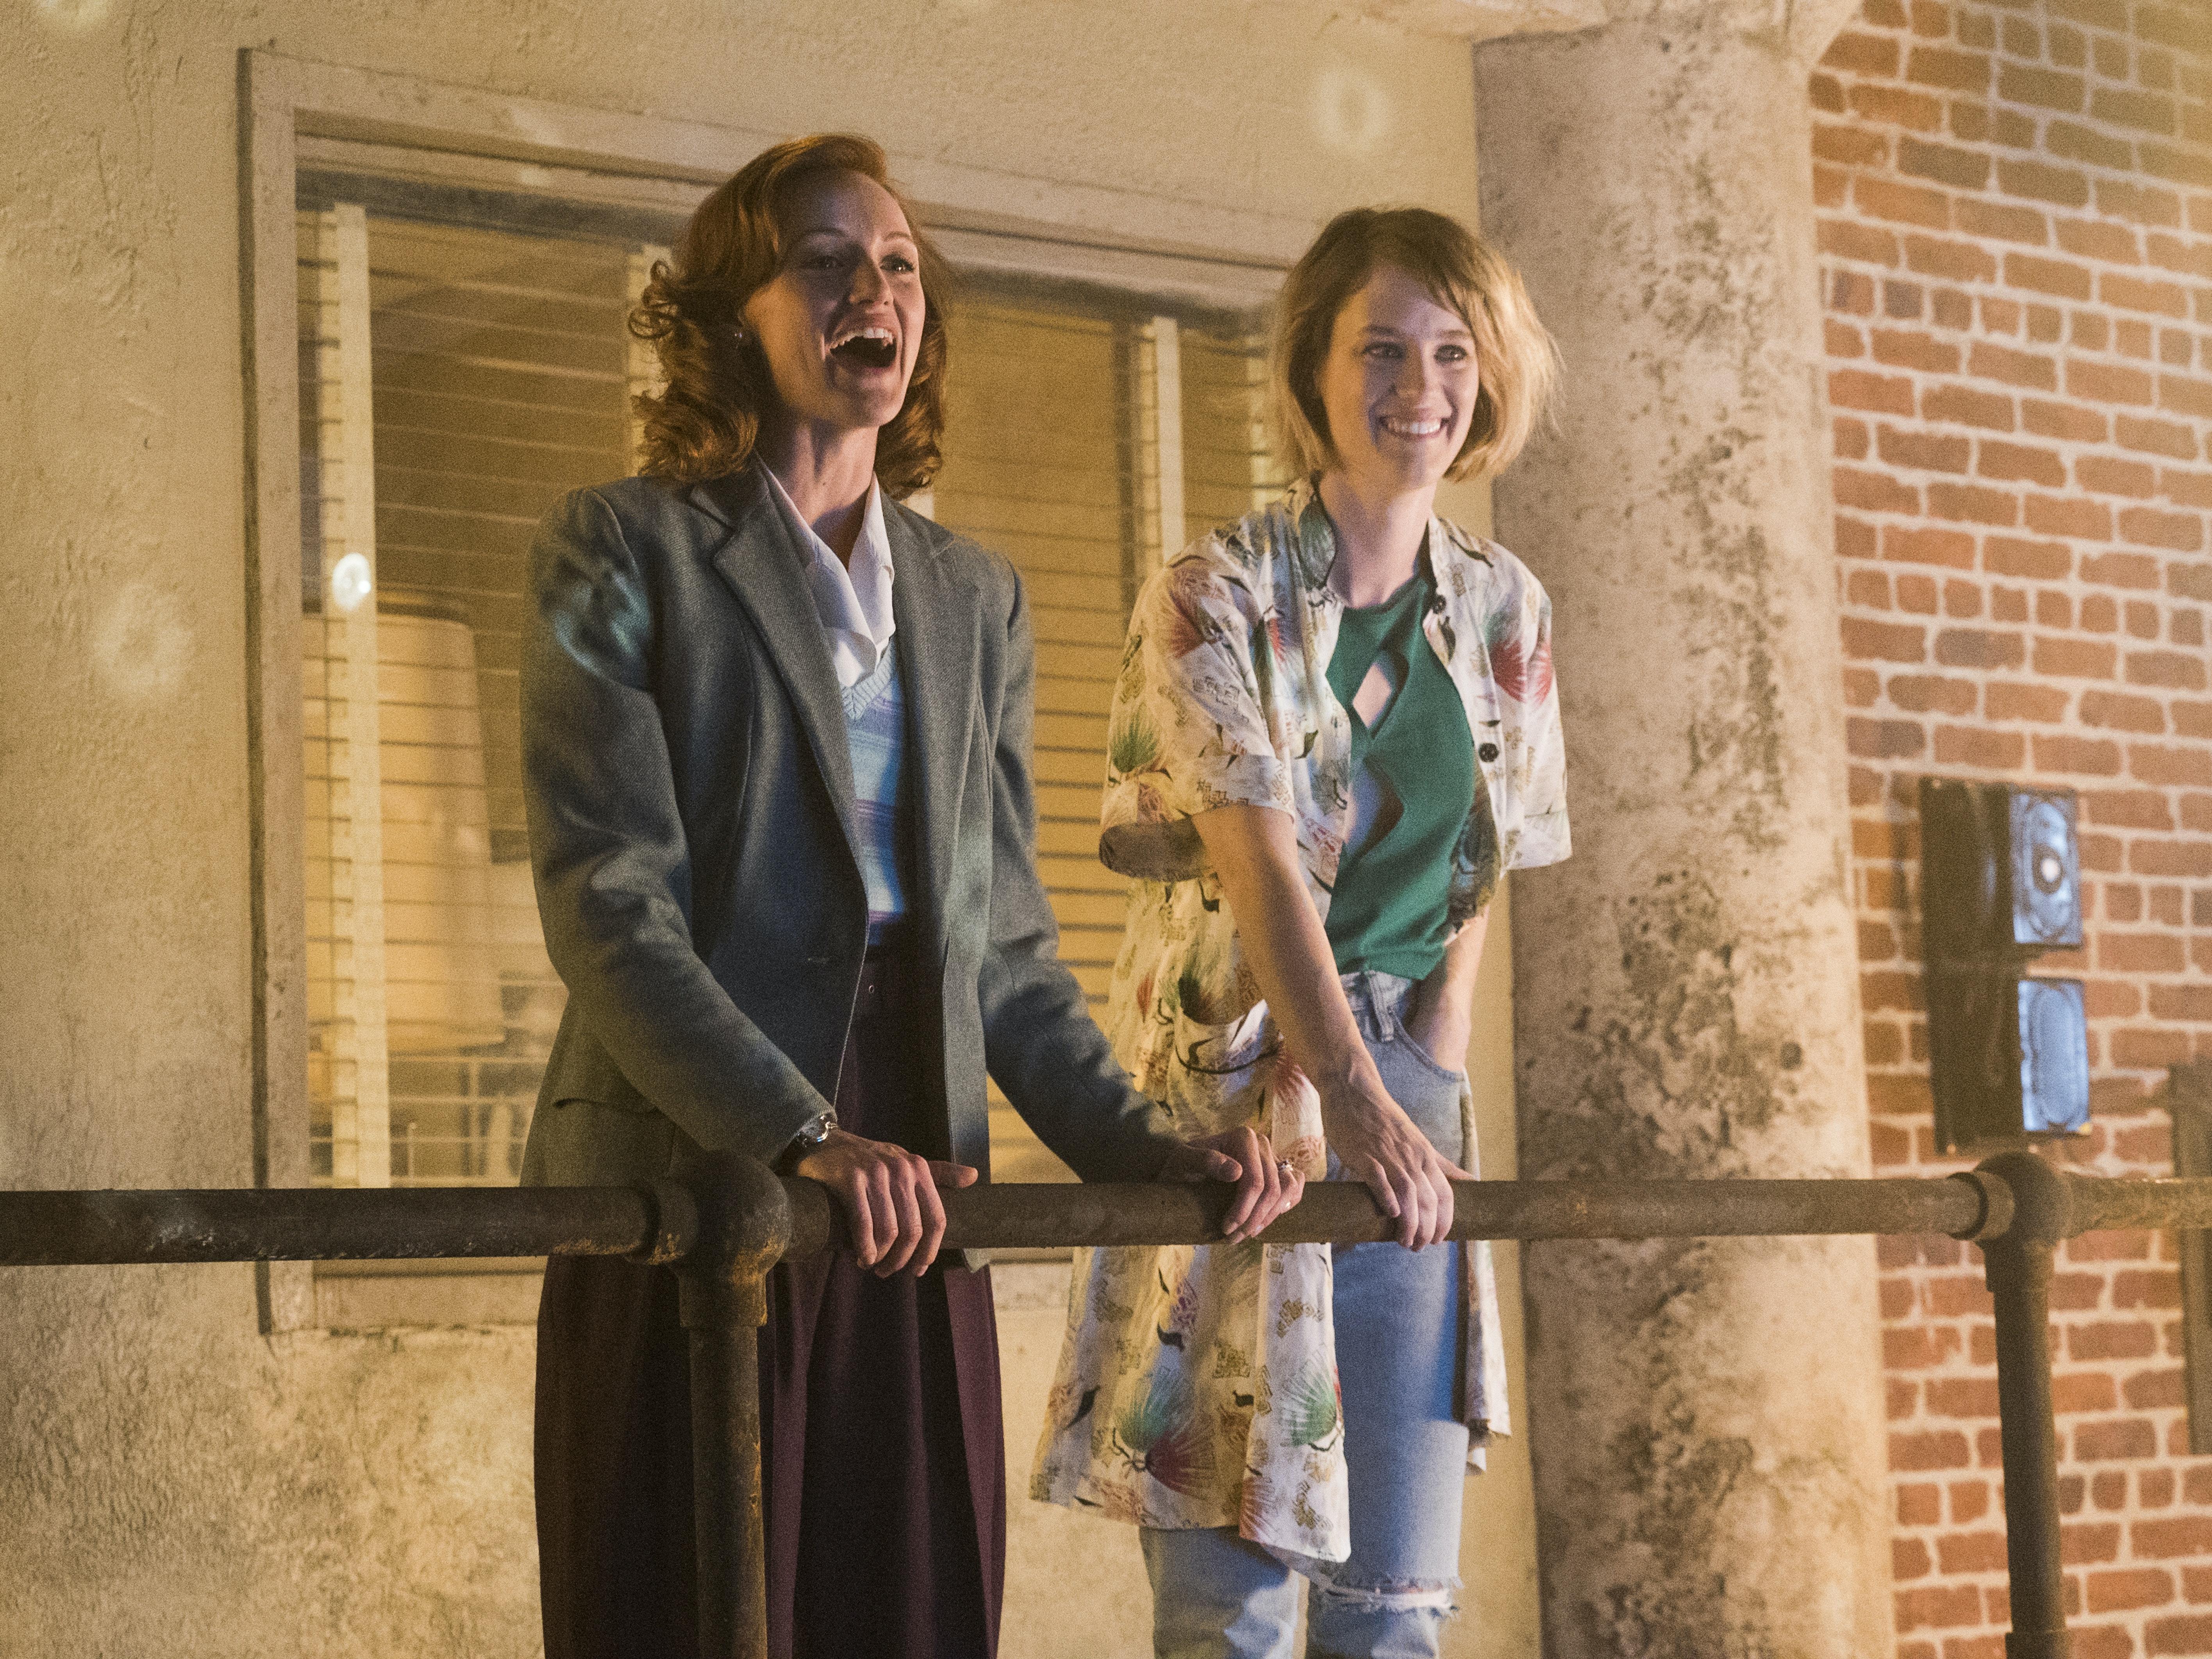 Kerry Bishé and Mackenzie Davis in 'Halt and Catch Fire'